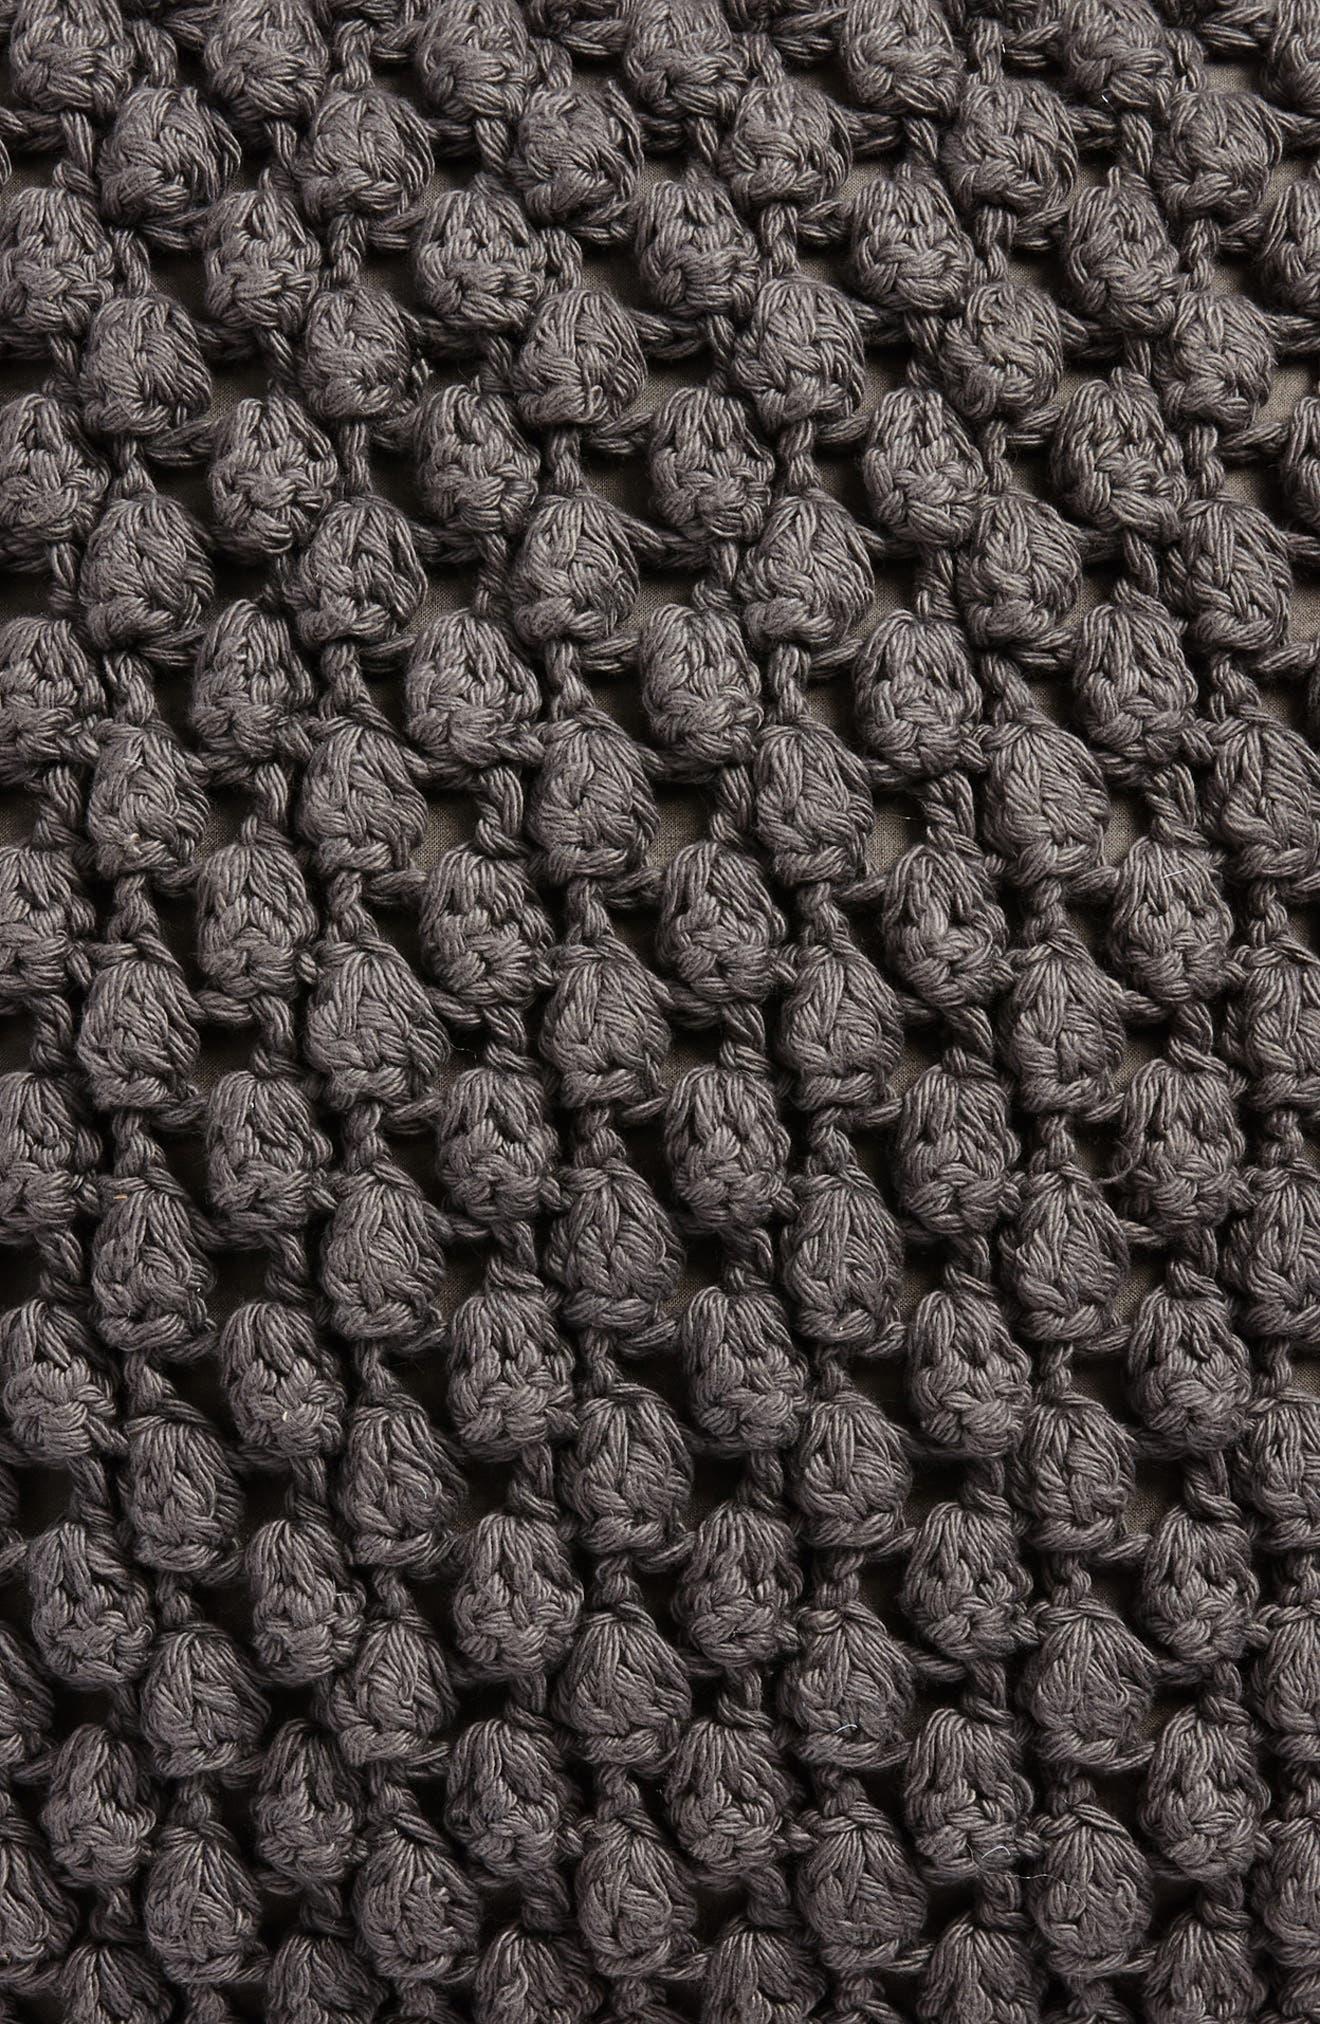 Pebble Knit Accent Pillow,                             Alternate thumbnail 3, color,                             Grey Onyx